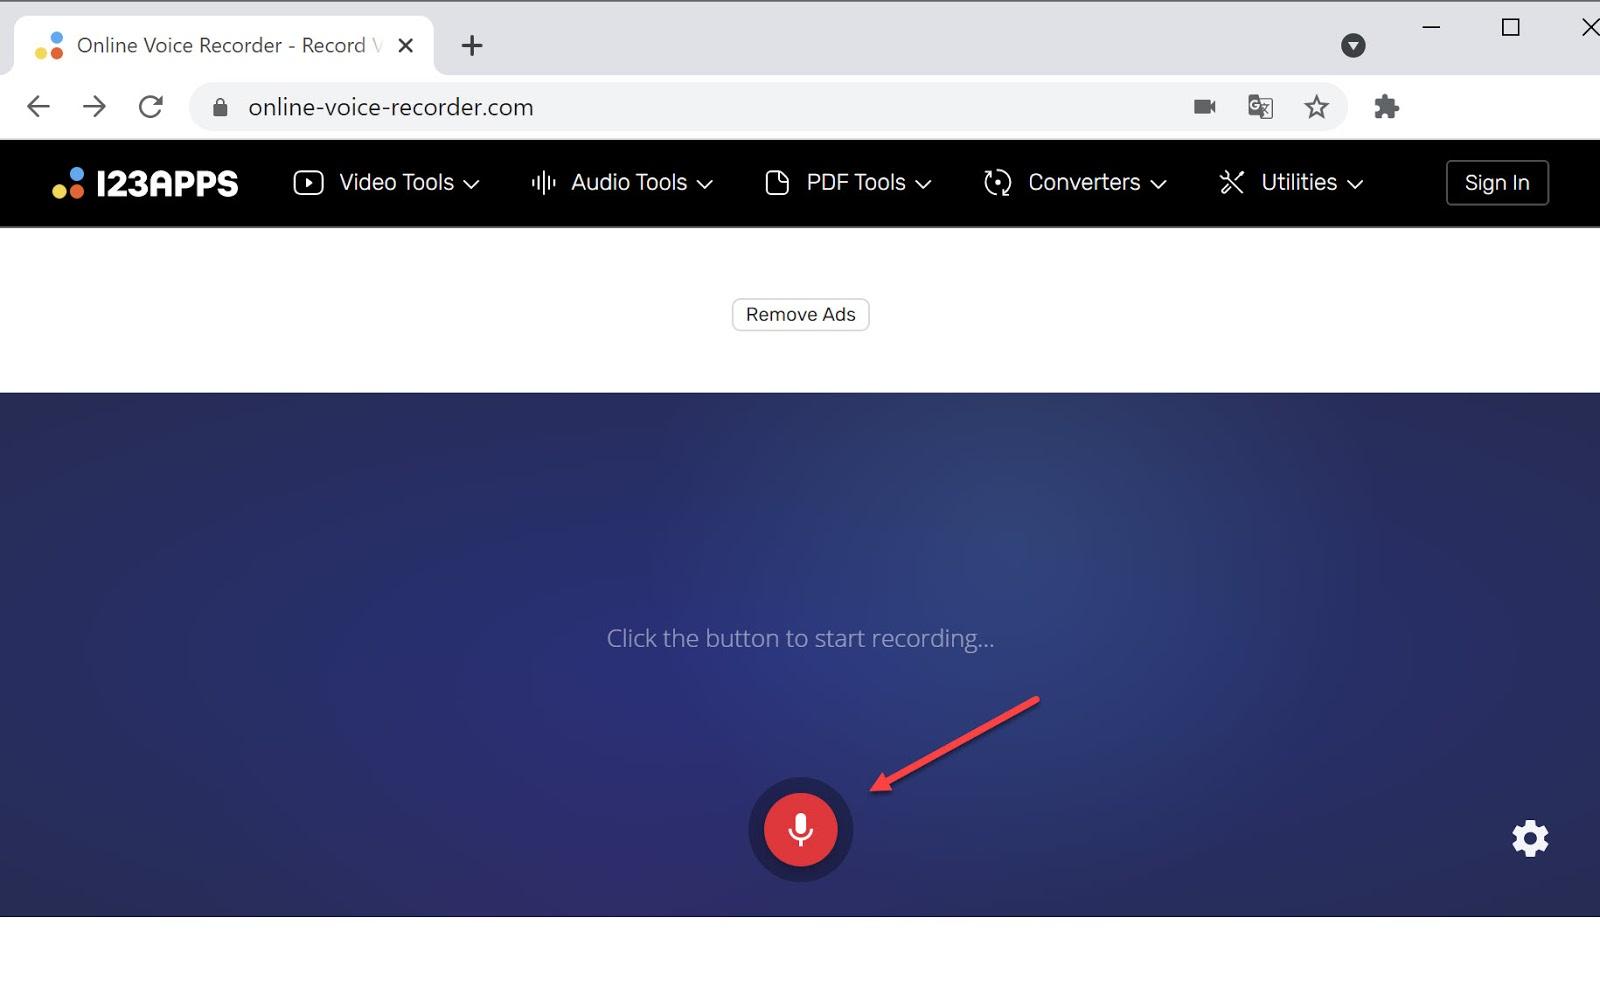 Screenshot of the Online Voice Recorder website